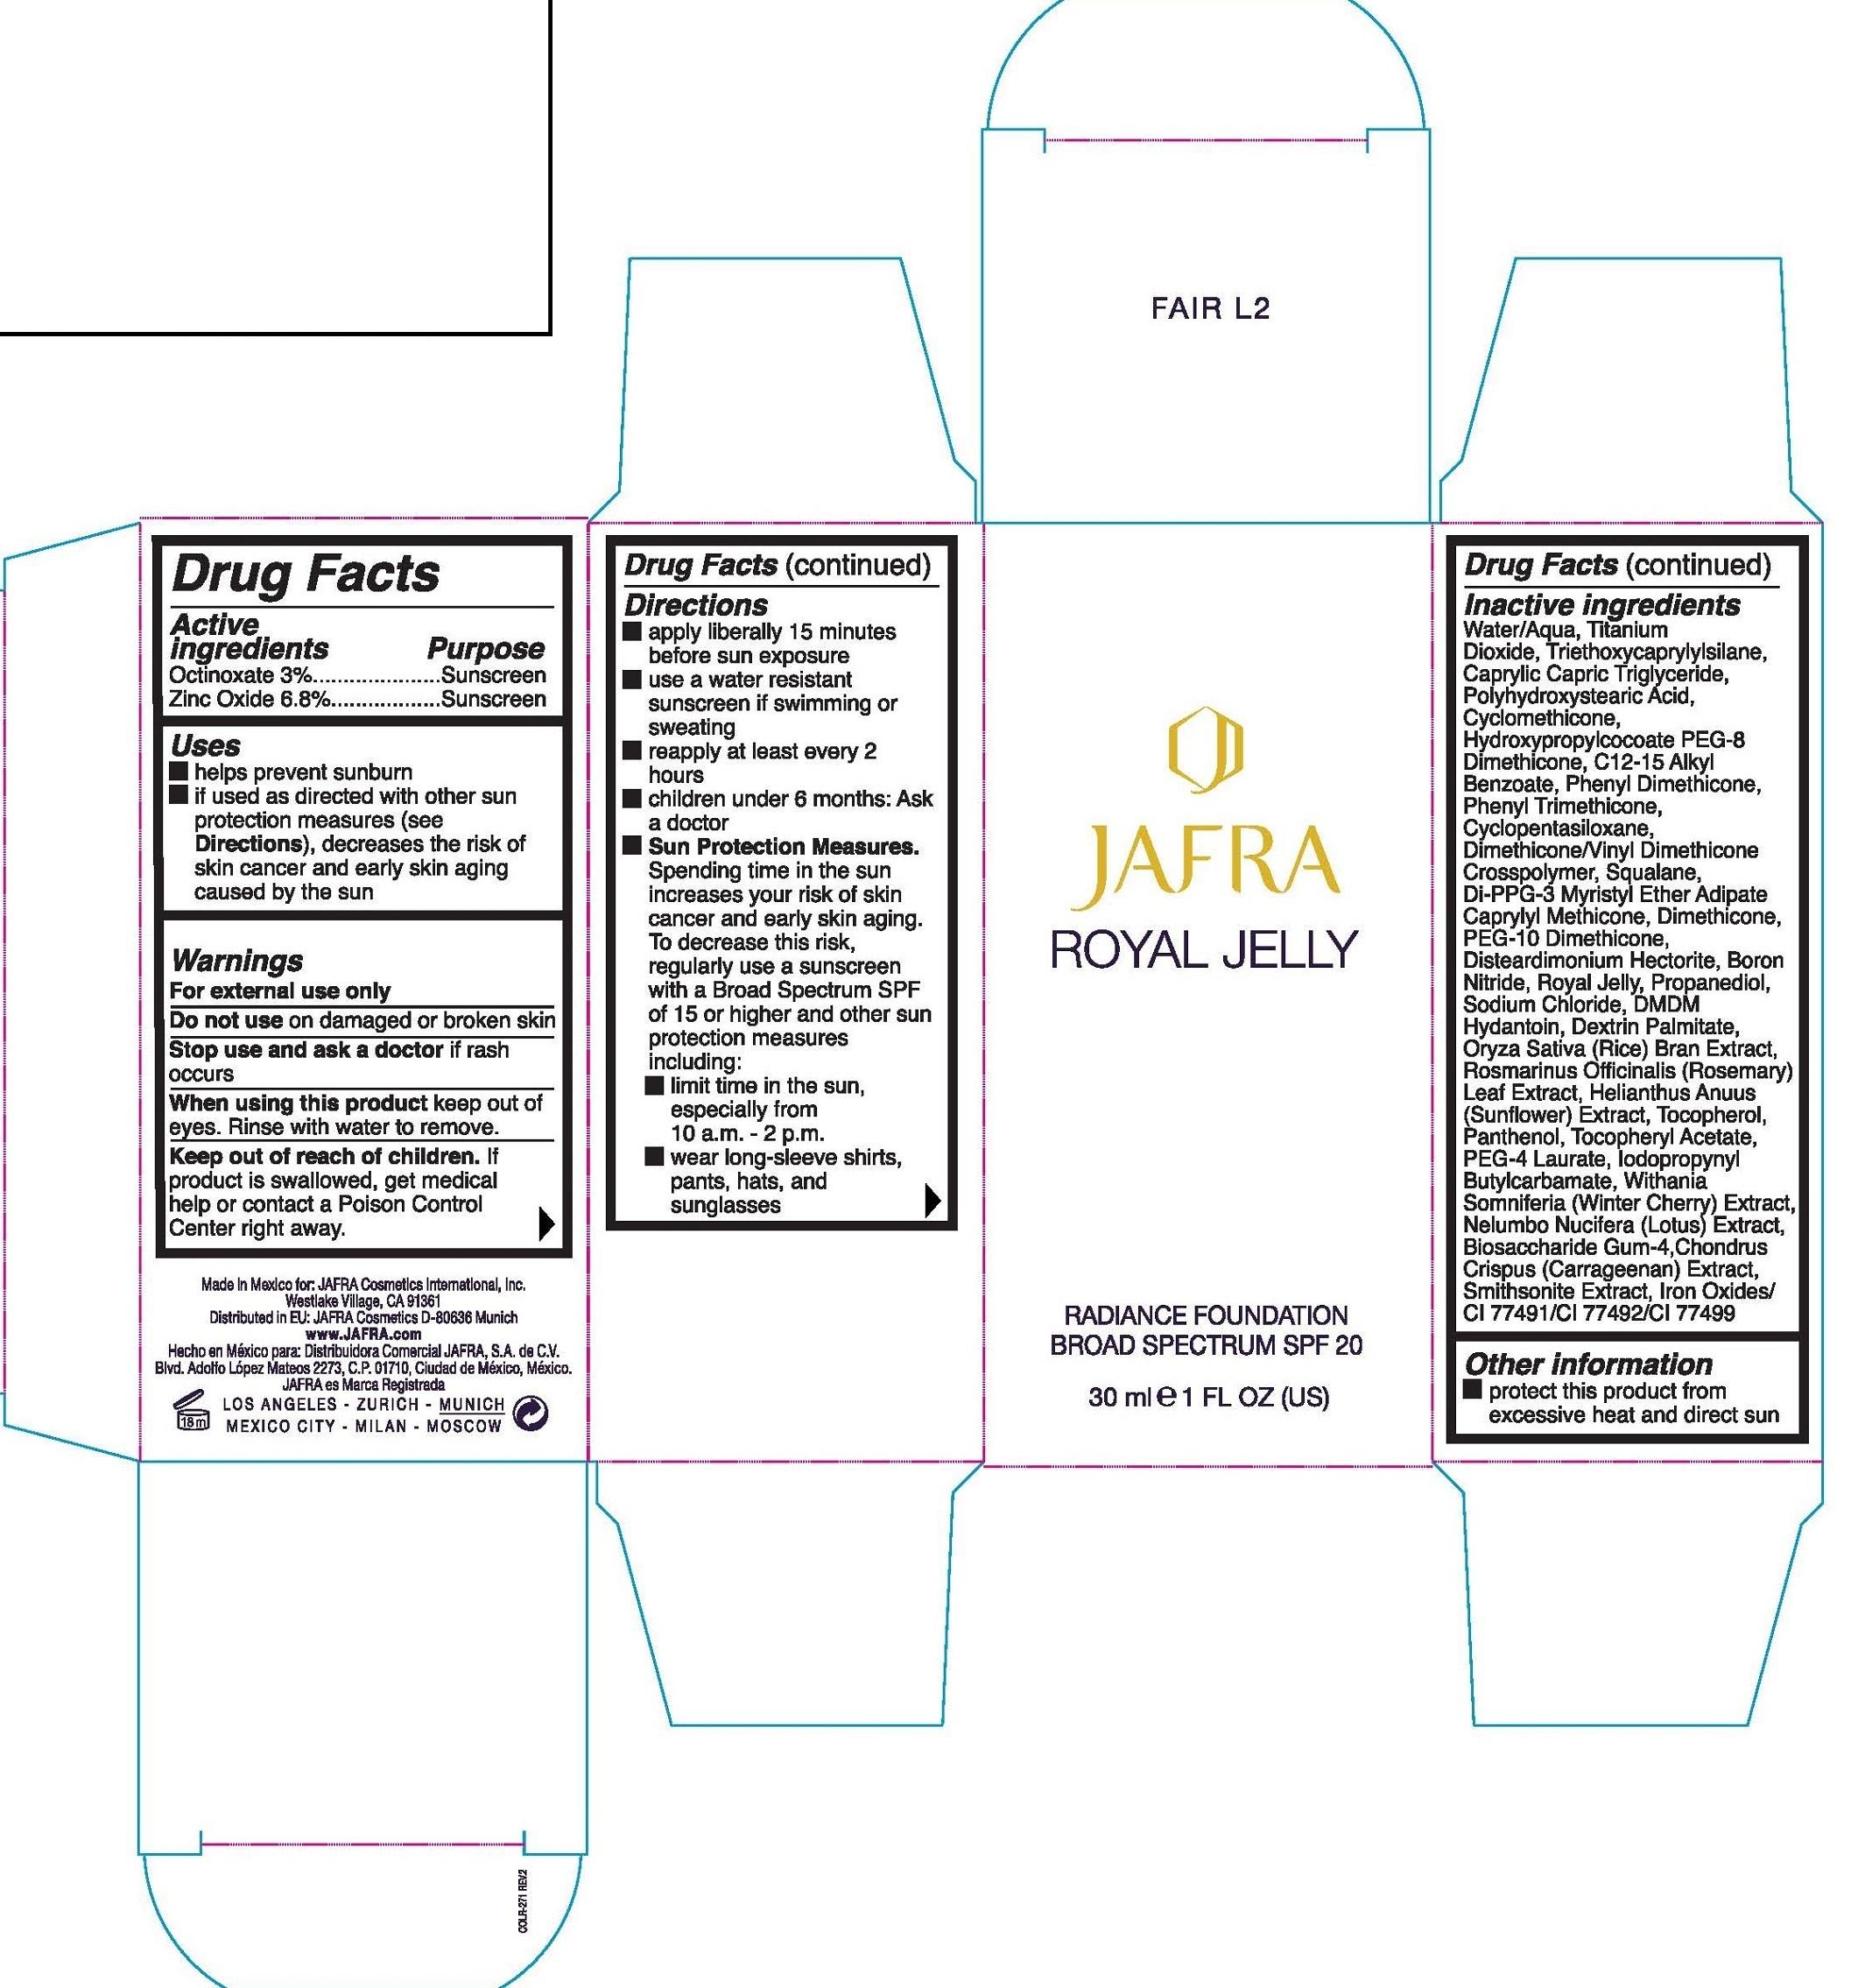 Royal Jelly. Label